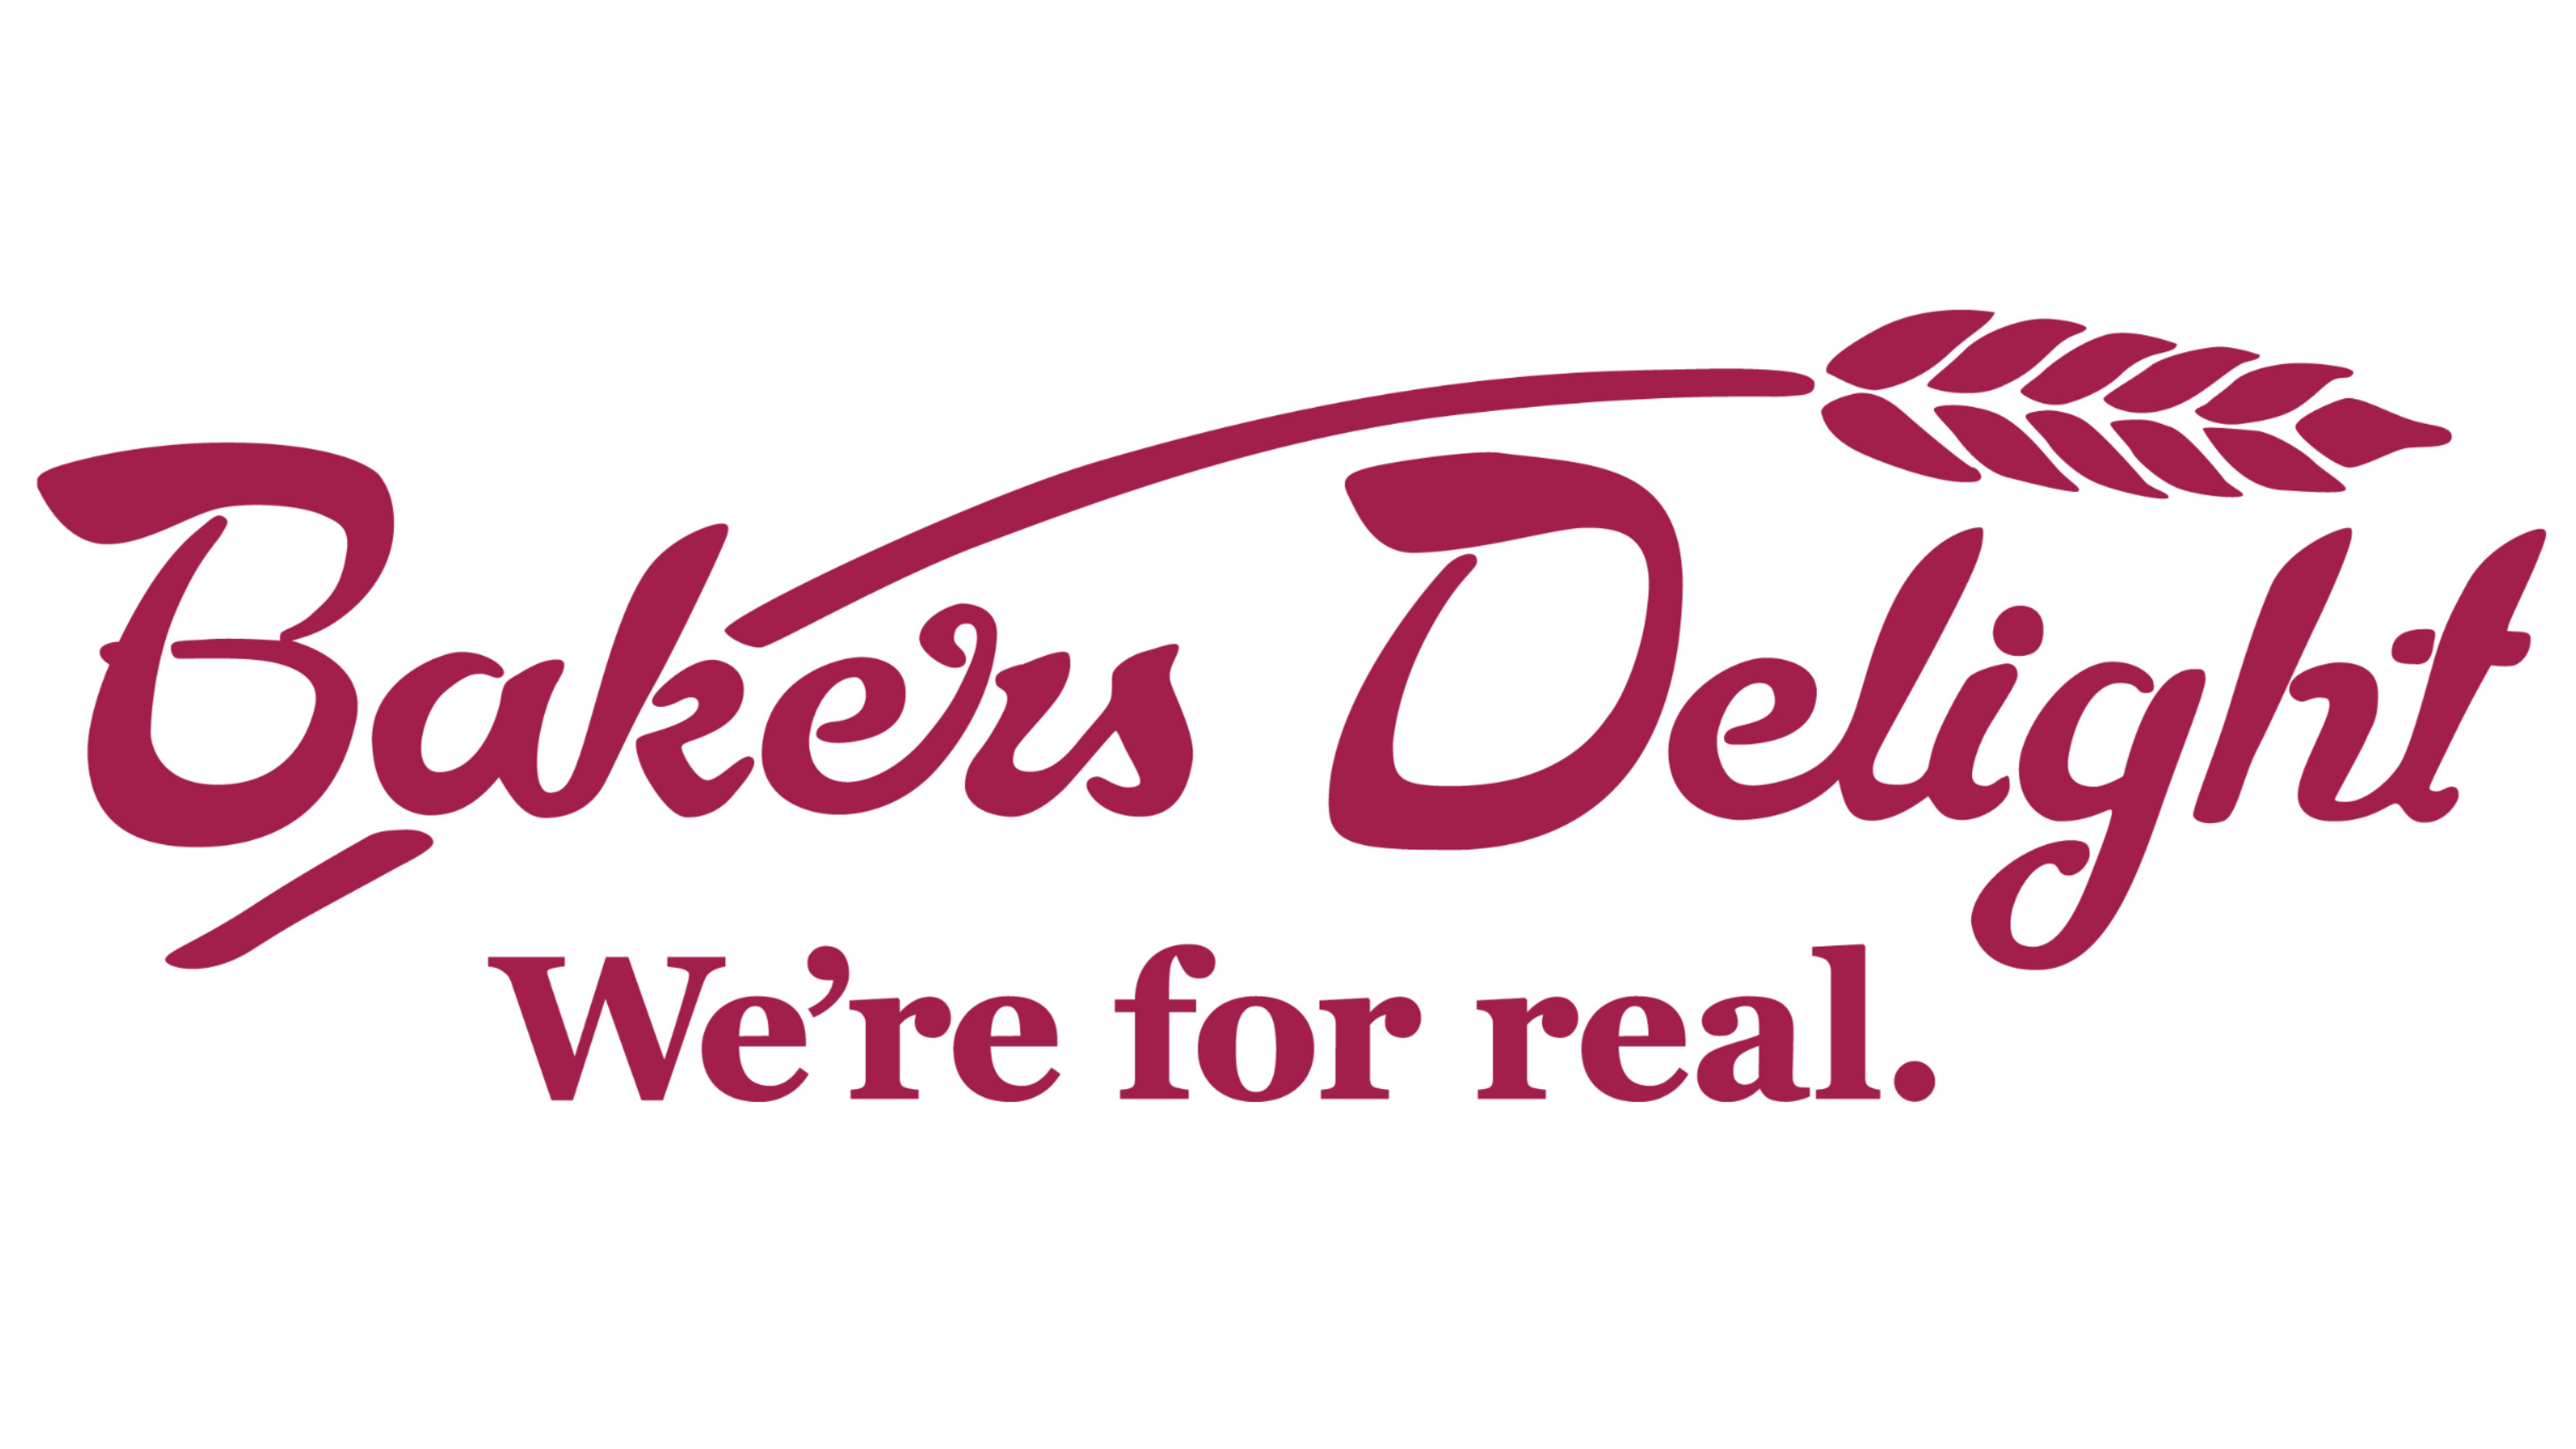 Bakers Delight (Screen)